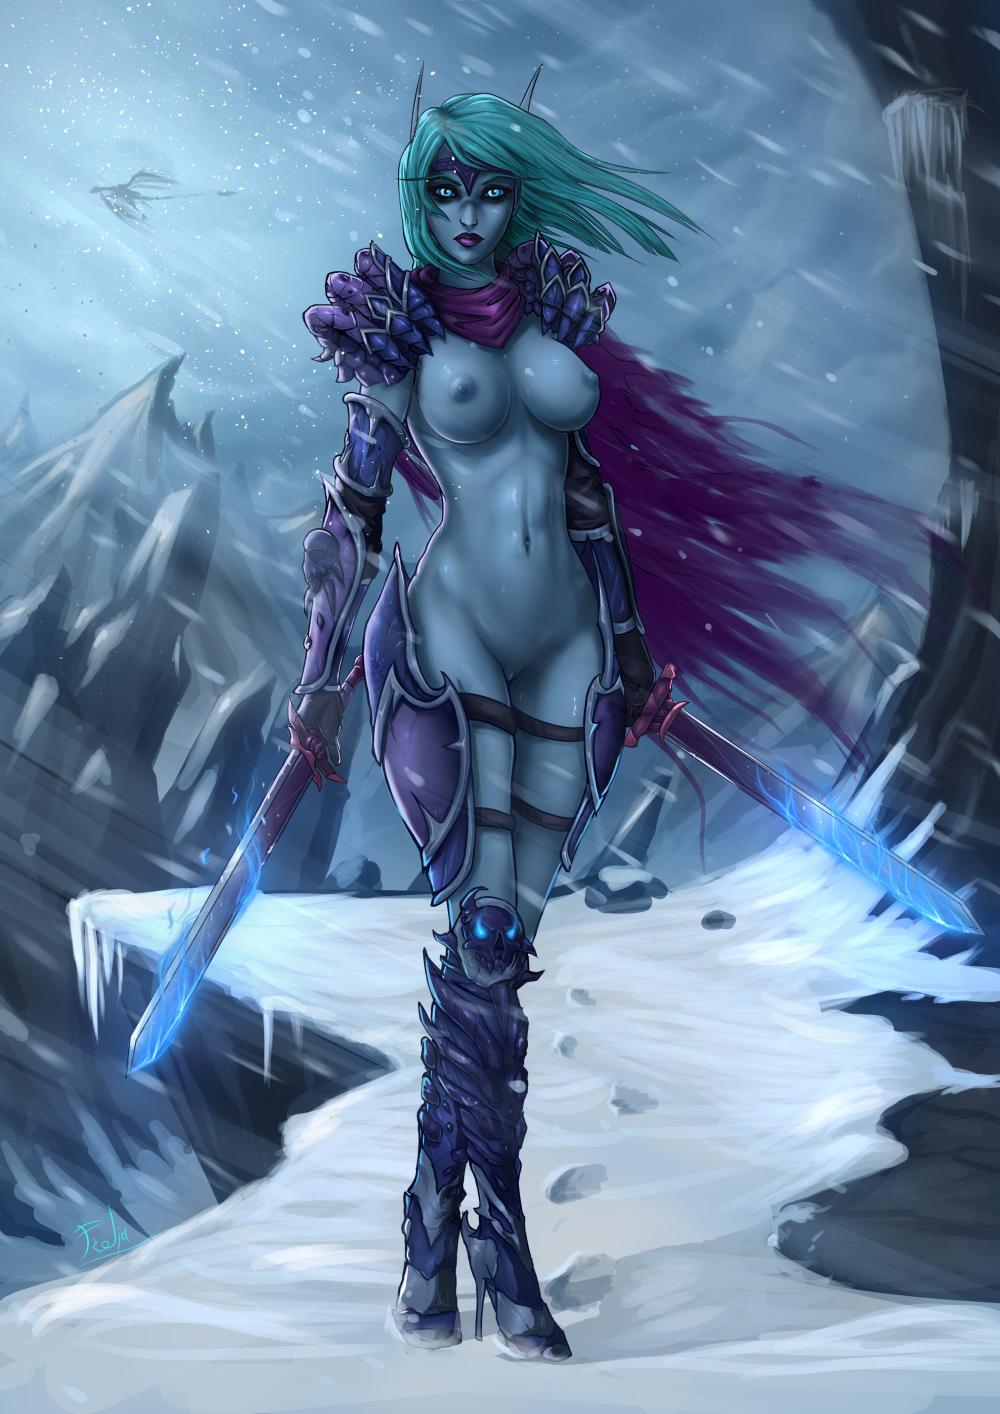 world blood of elf hentai warcraft Destiny 2 forsaken mara sov